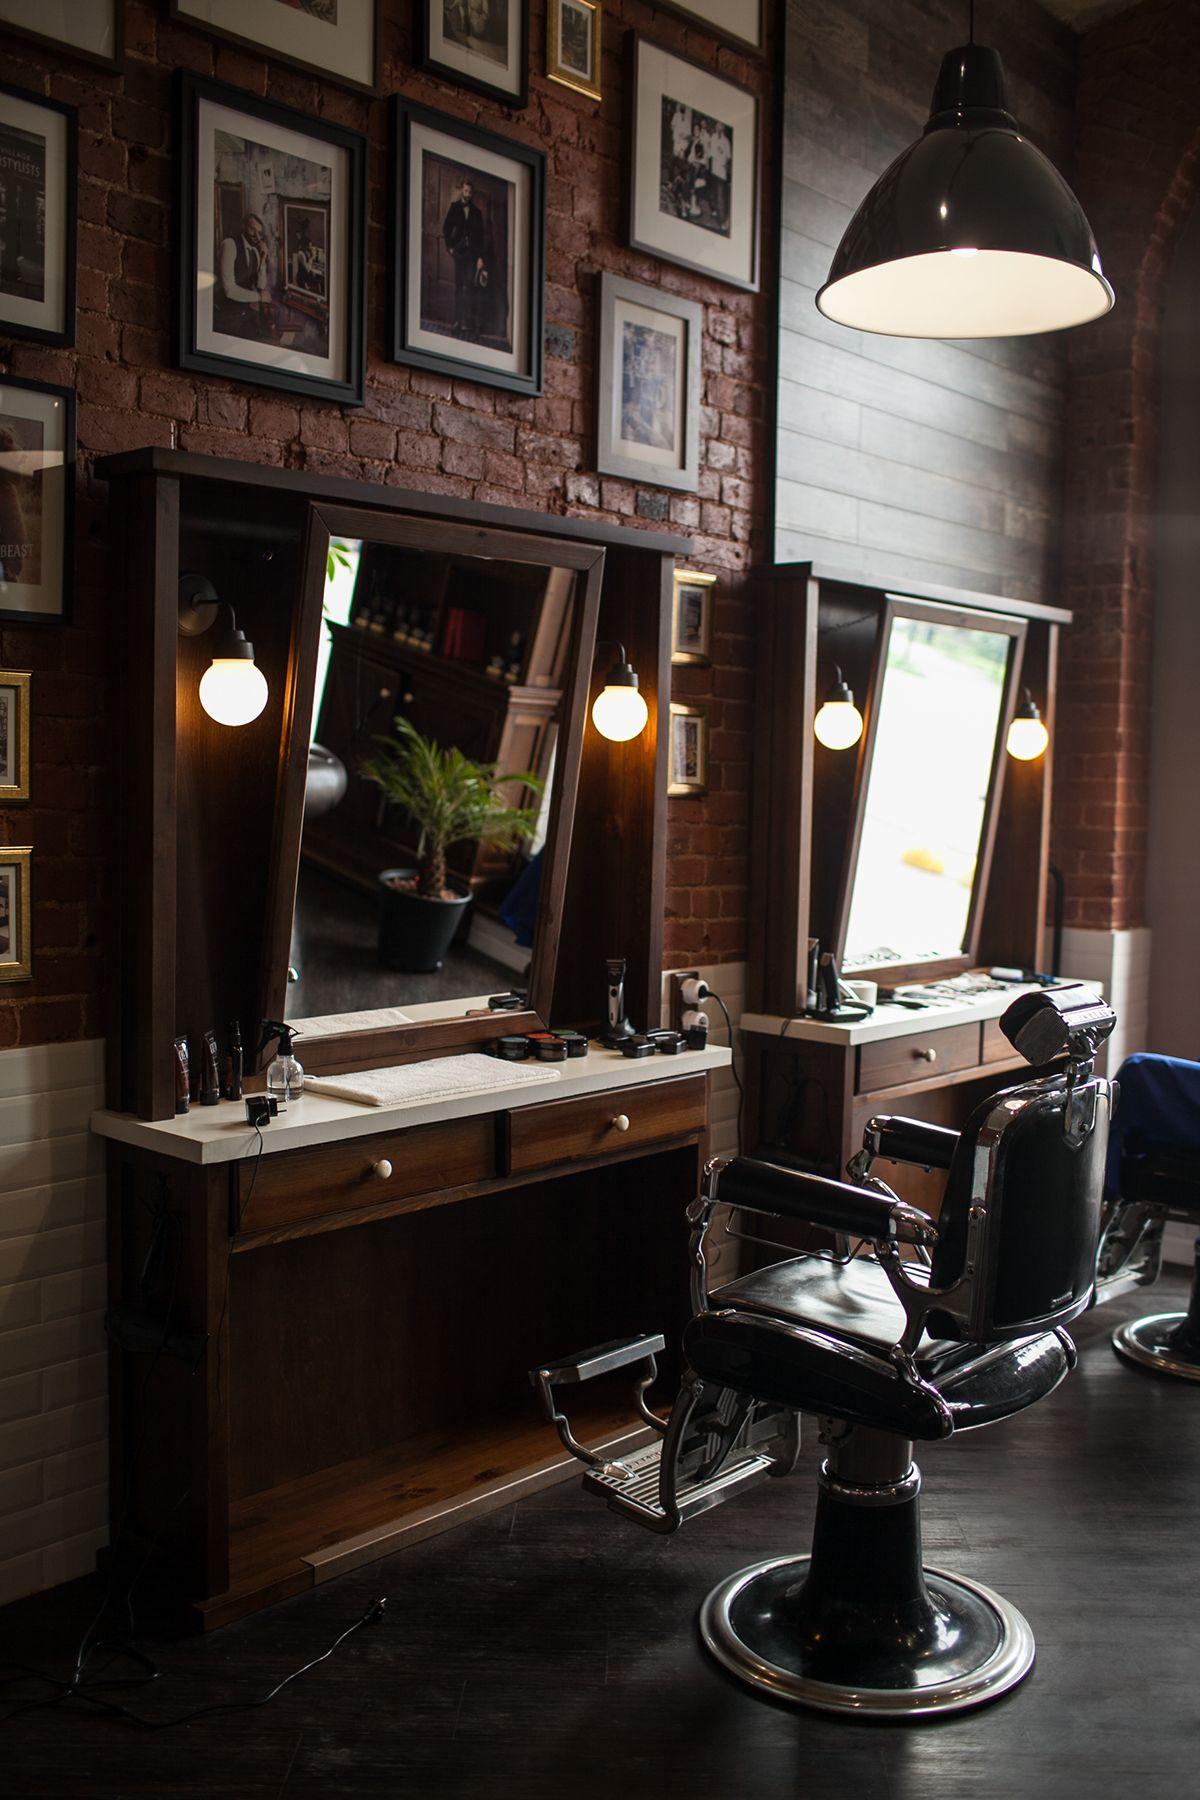 Barbershop Mr Right on Behance ARQ Barbearia